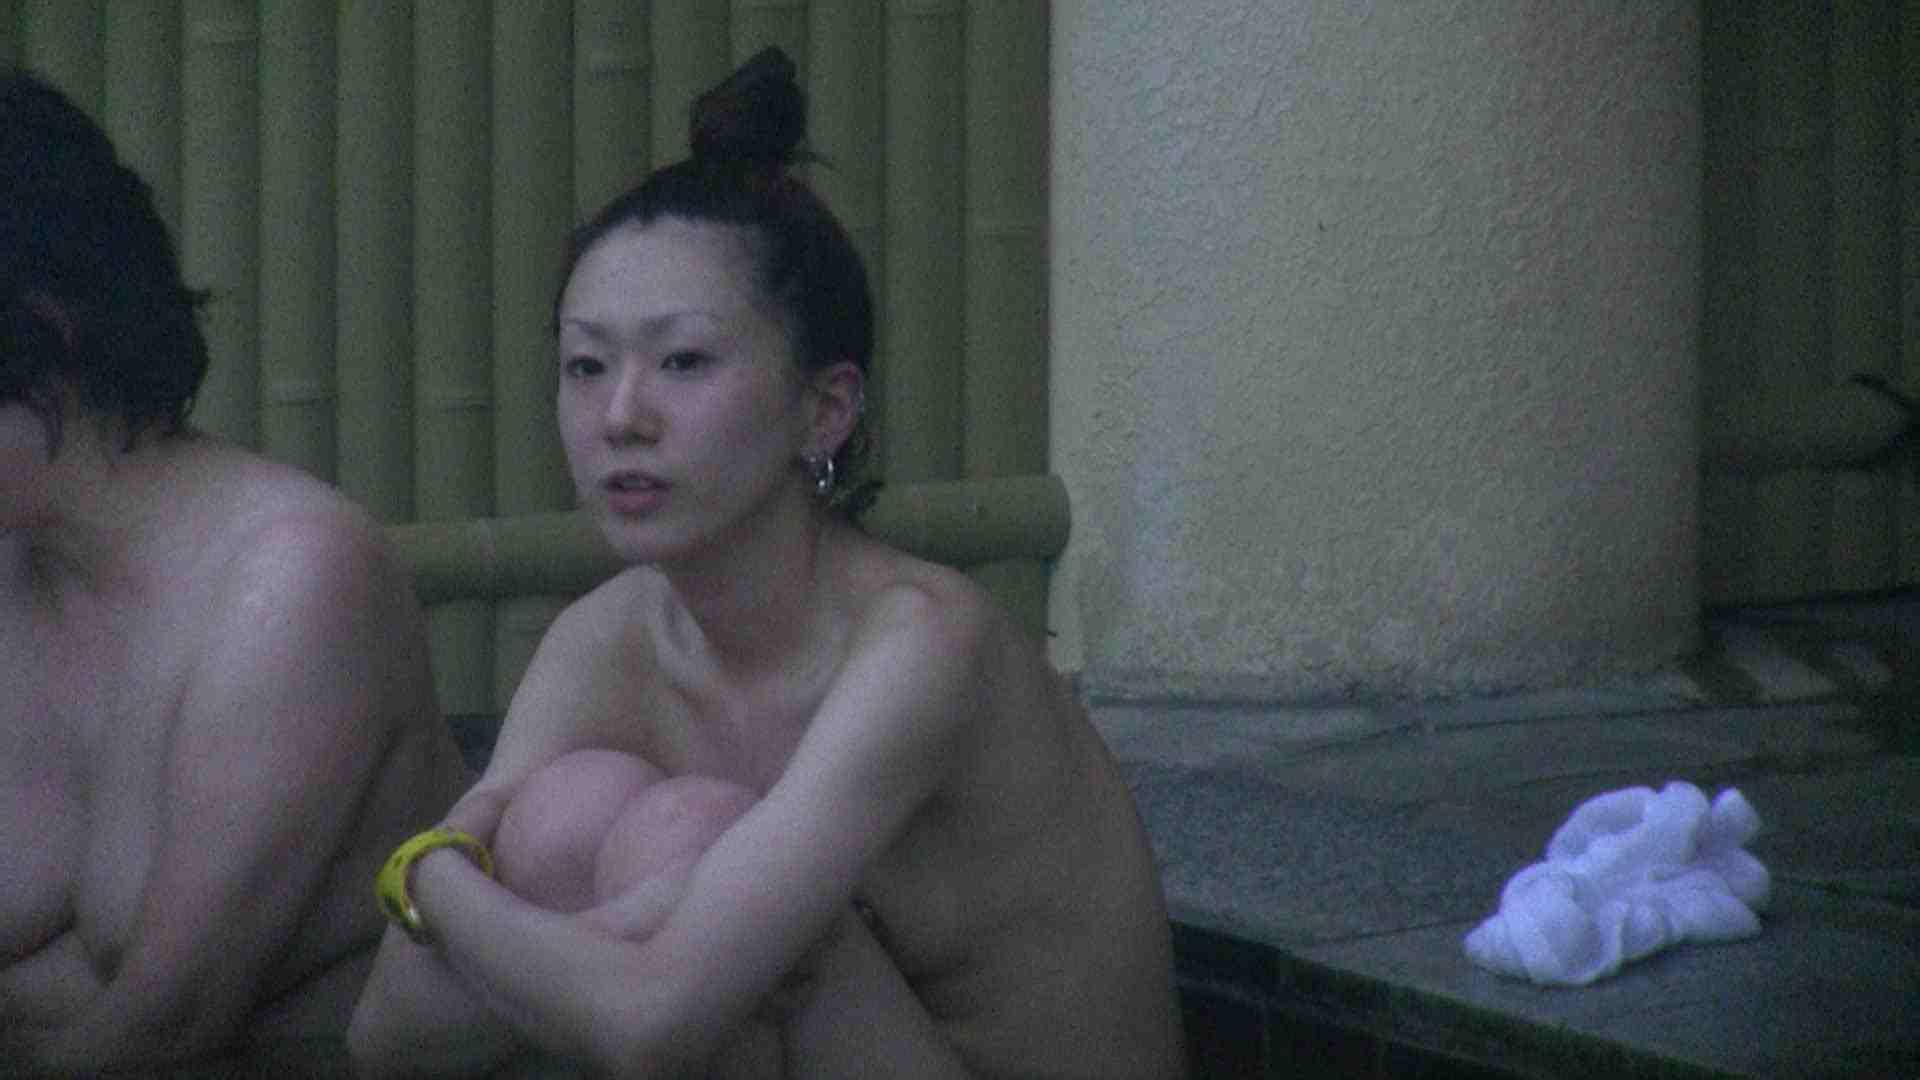 Aquaな露天風呂Vol.587 OLすけべ画像 隠し撮りオマンコ動画紹介 29連発 20